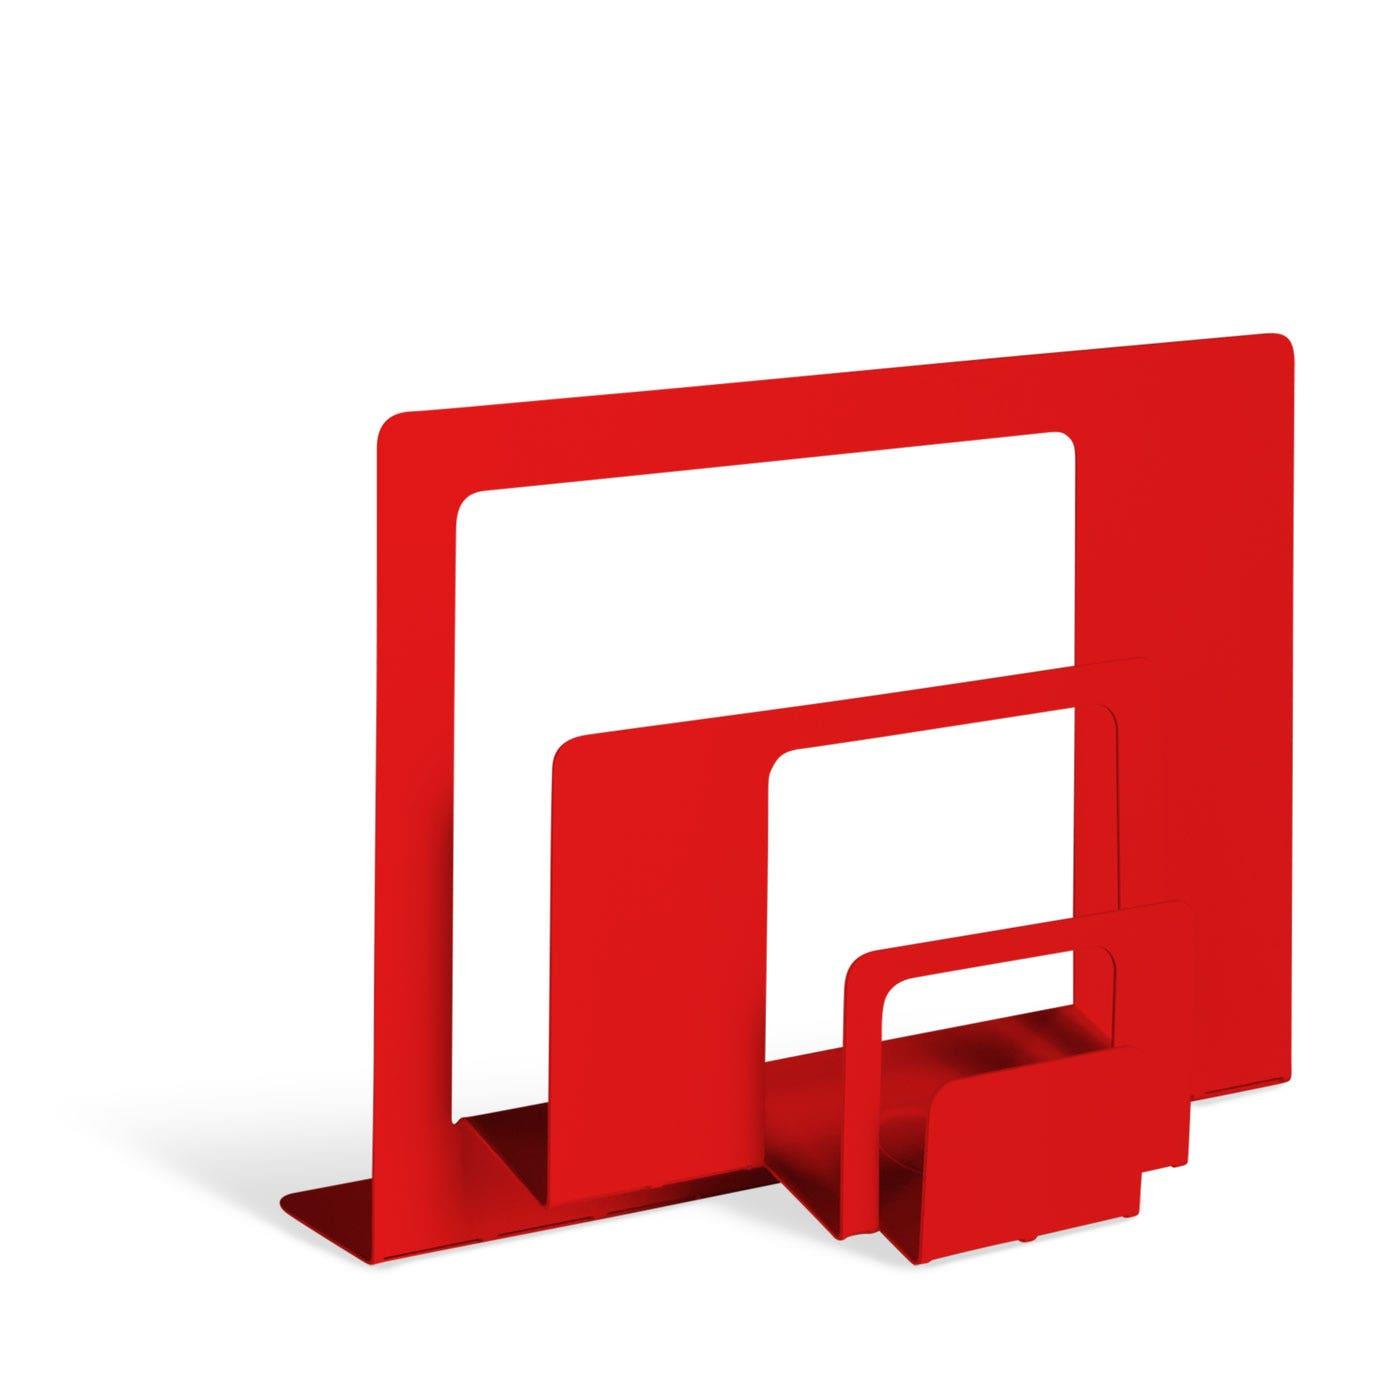 2D 3D Letter Holder Modern Desk Accessories